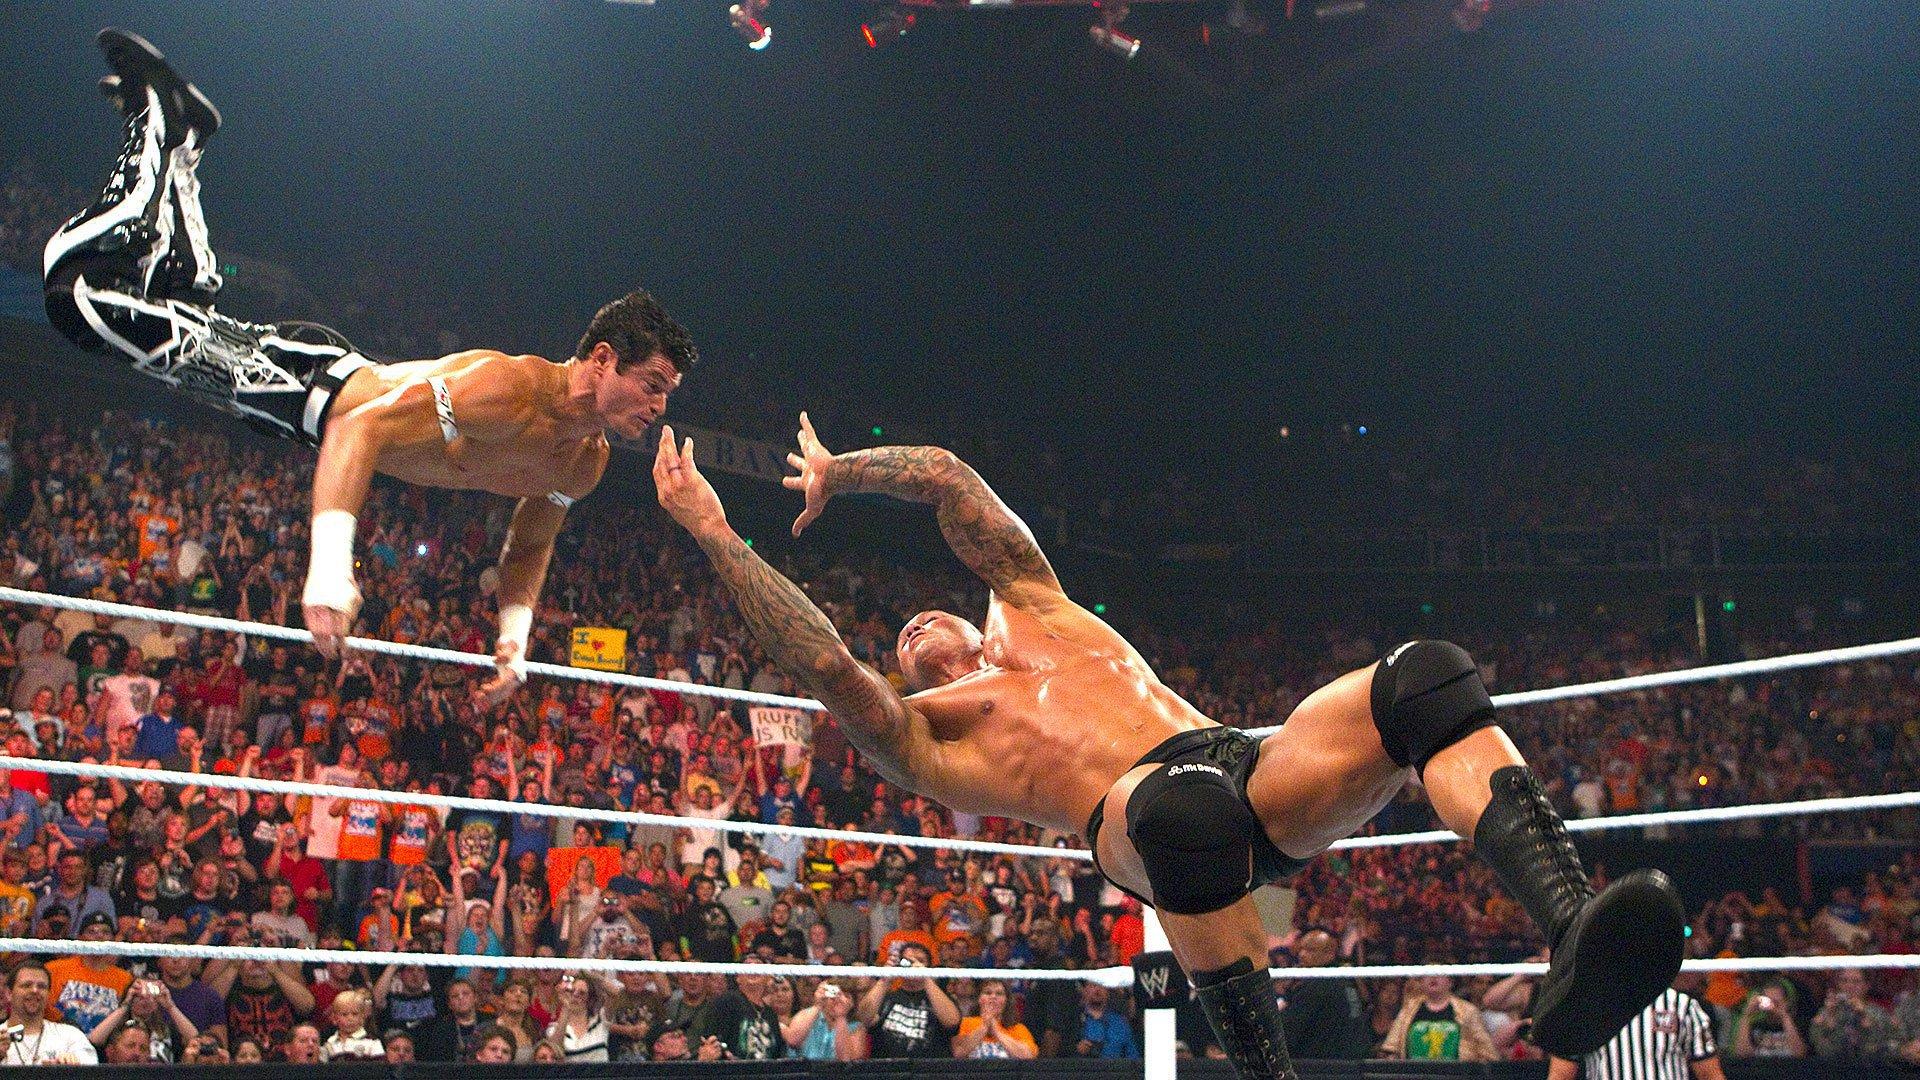 Randy Orton fauche Evan Bourne d'un RKO en plein vol: Raw, 12 juillet 2010